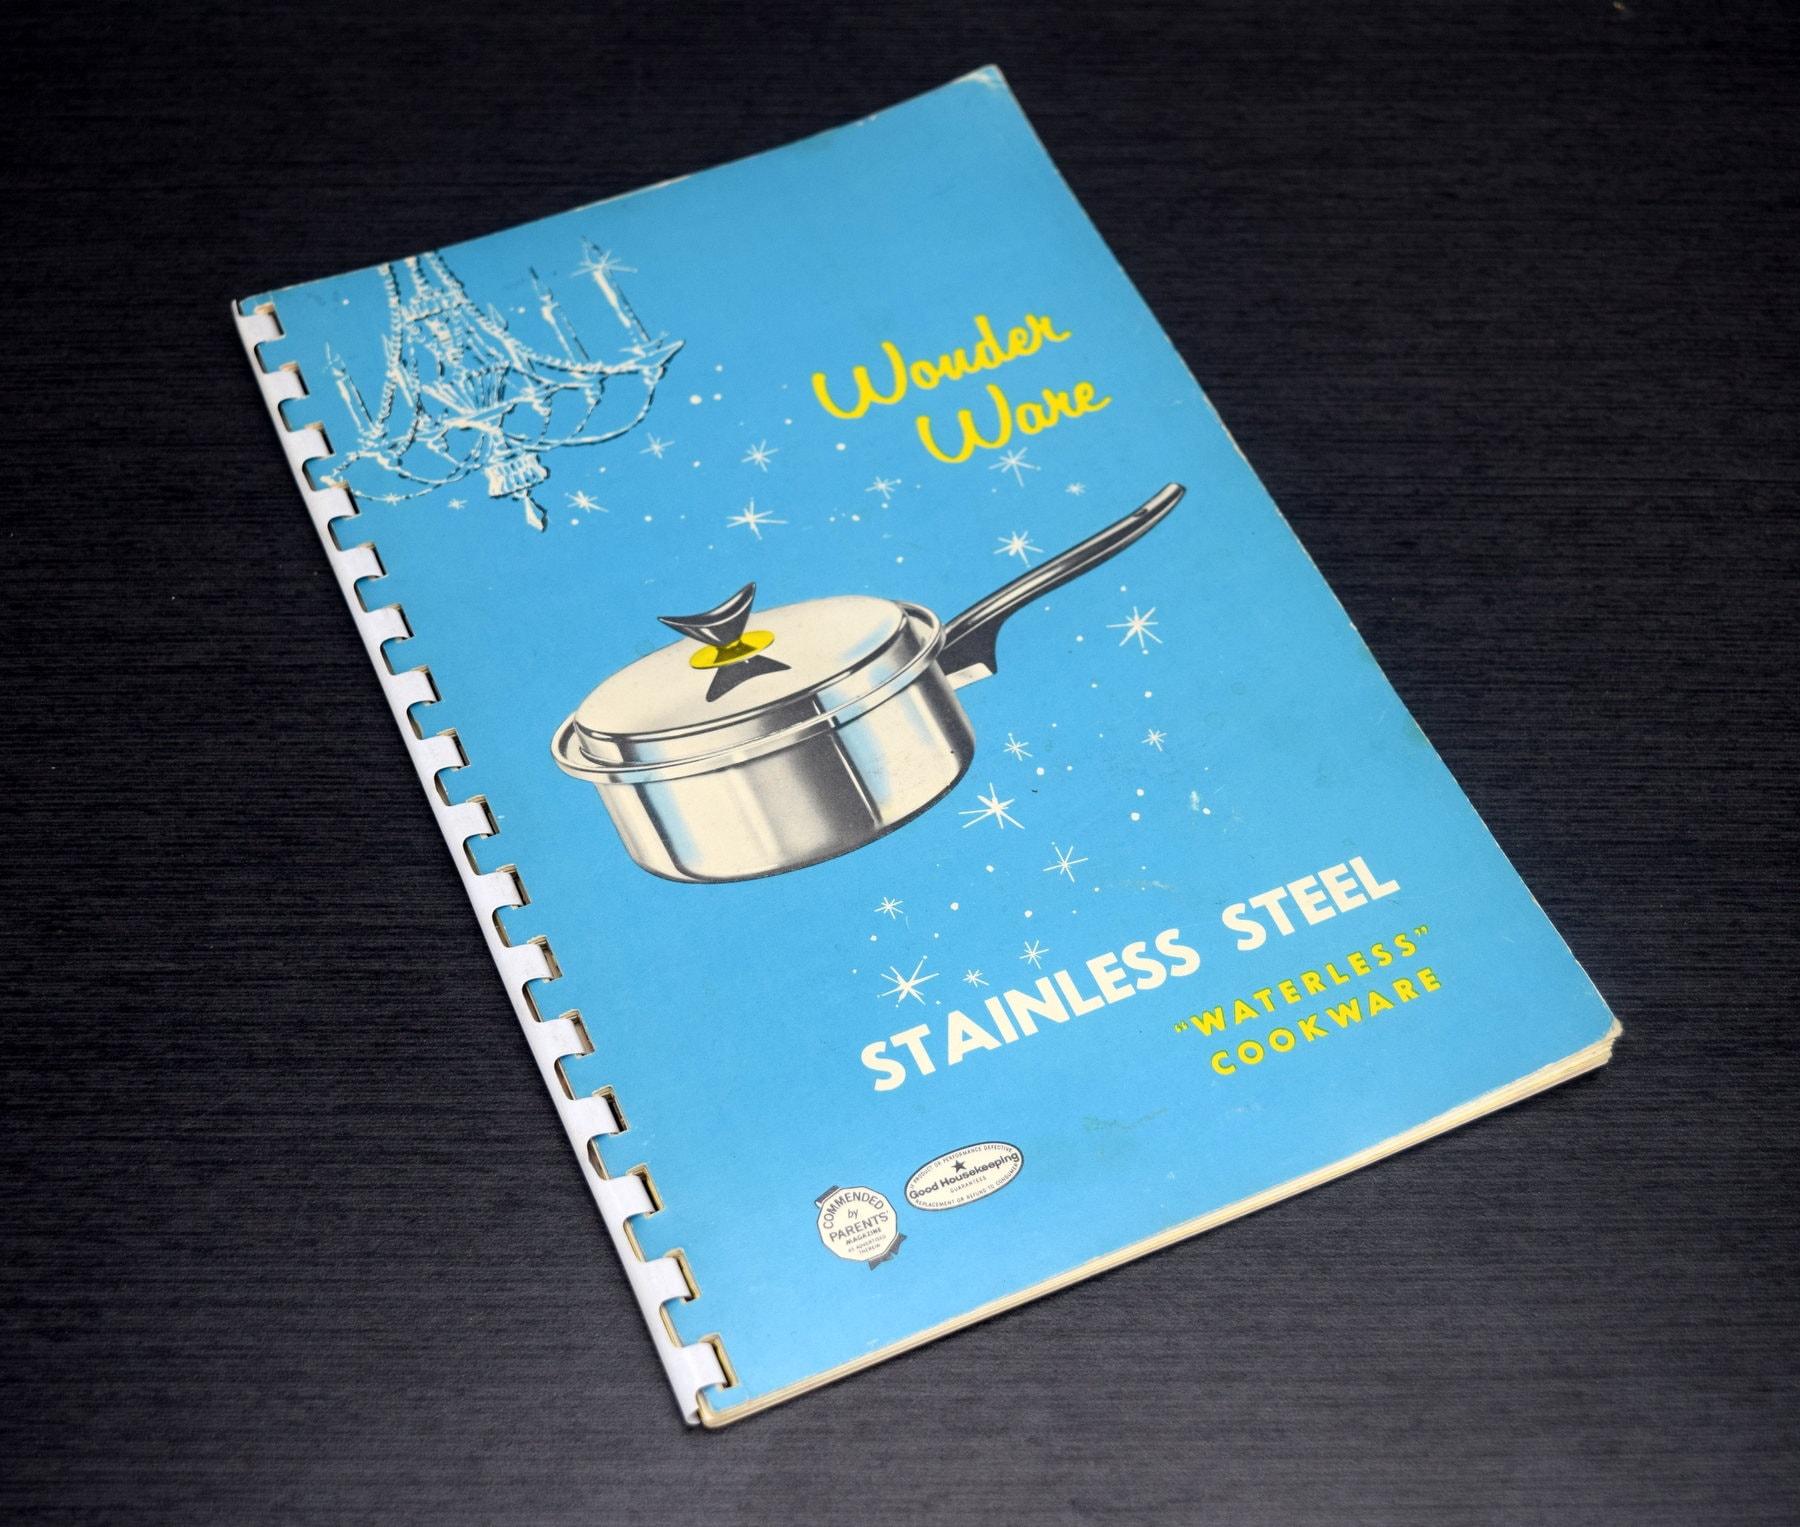 Waterless cookware recipe book besto blog for Kitchen craft cookware reviews